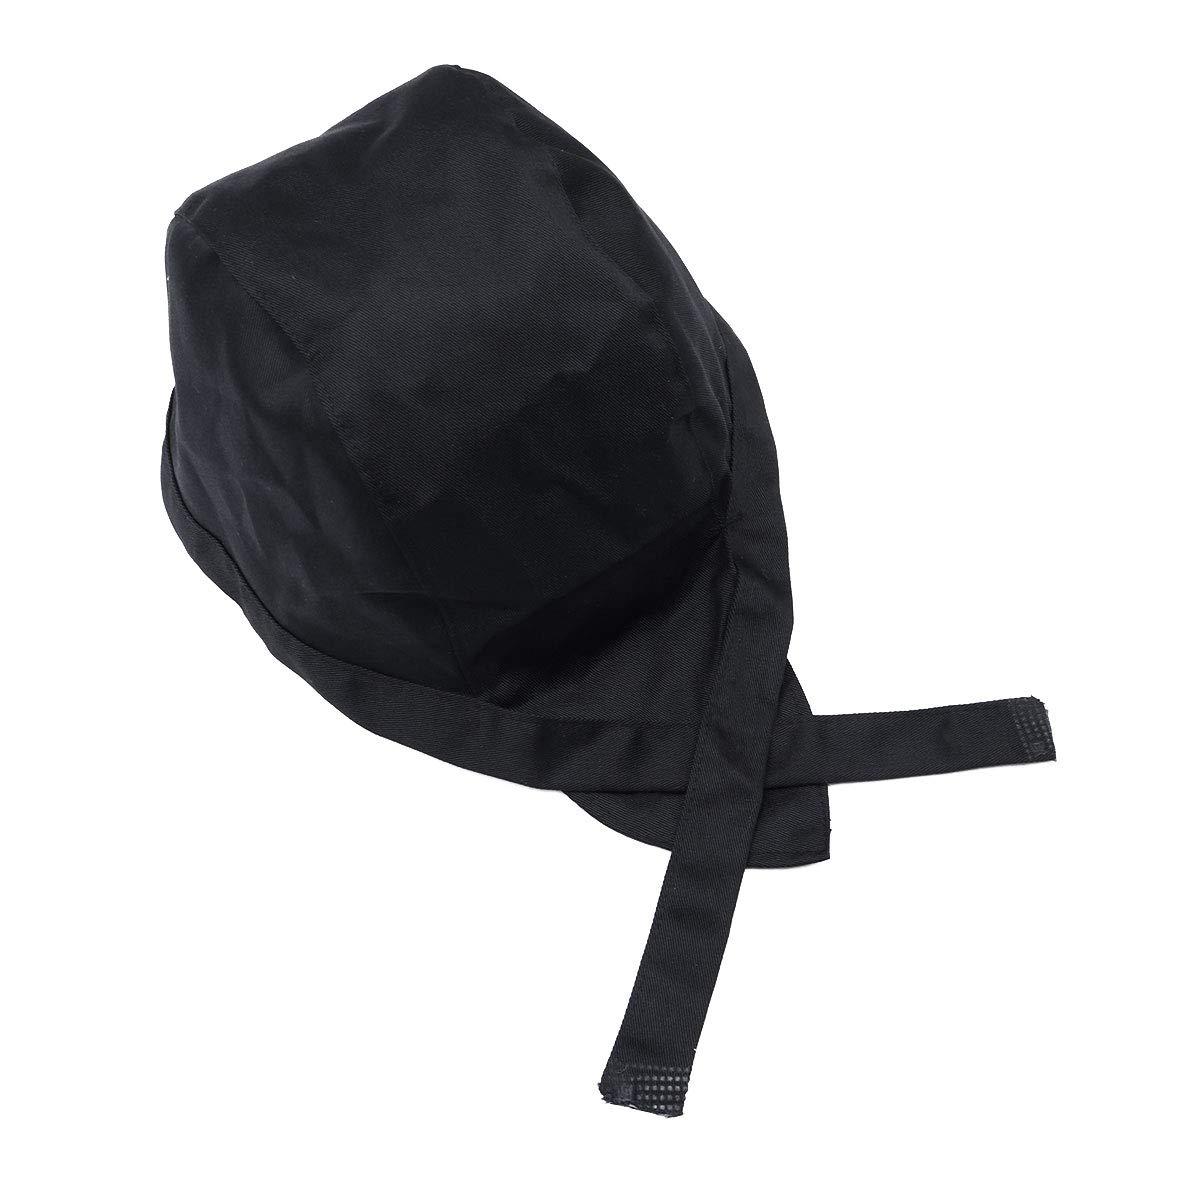 Negro Artibetter Cocina Catering Skull Cap Tie Back Chef Pirata Ribbon Hat